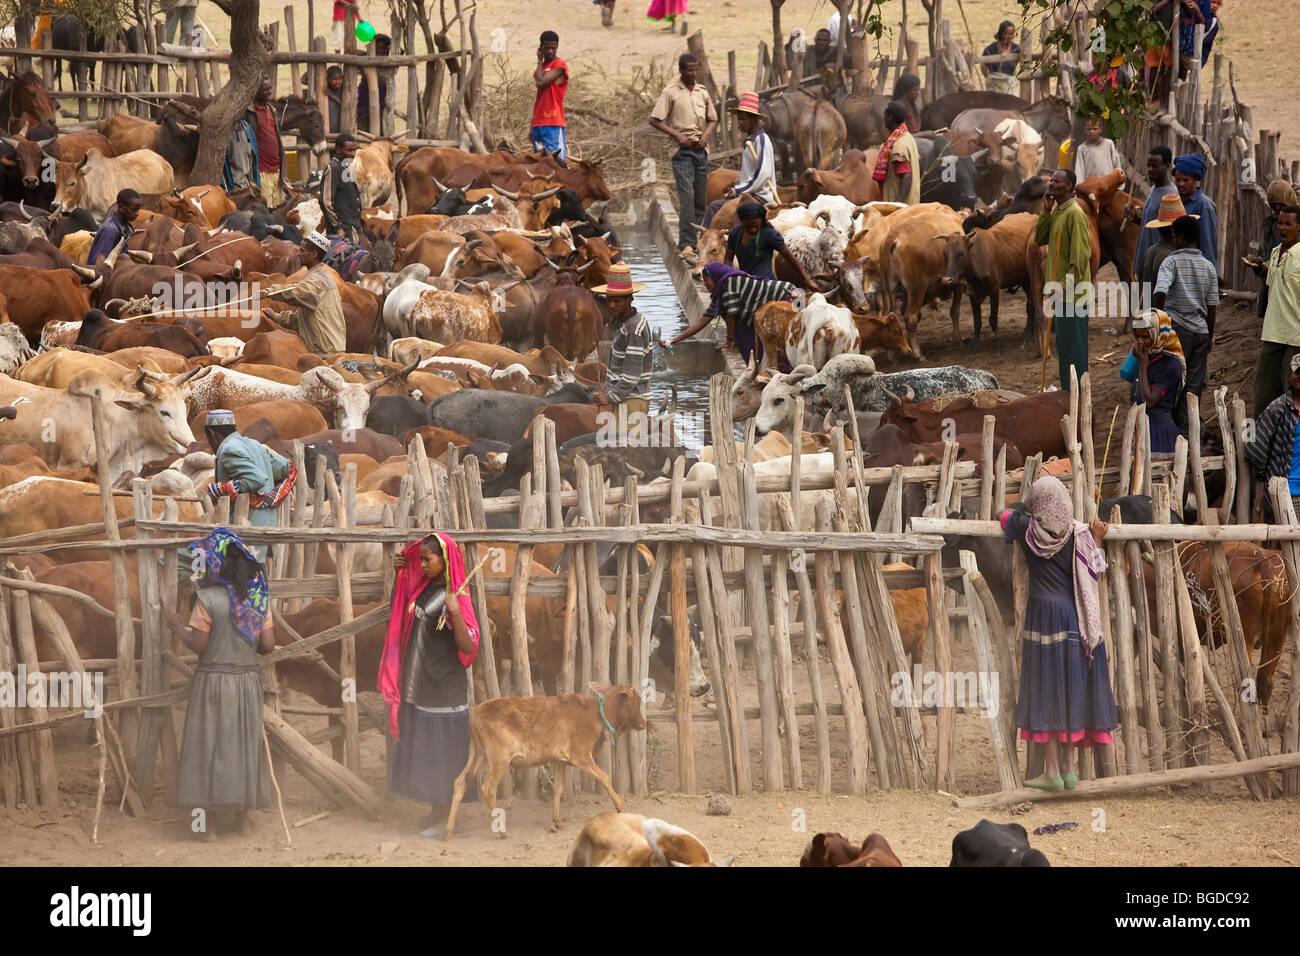 Cows at watering hole, Halaba, Ethiopia - Stock Image